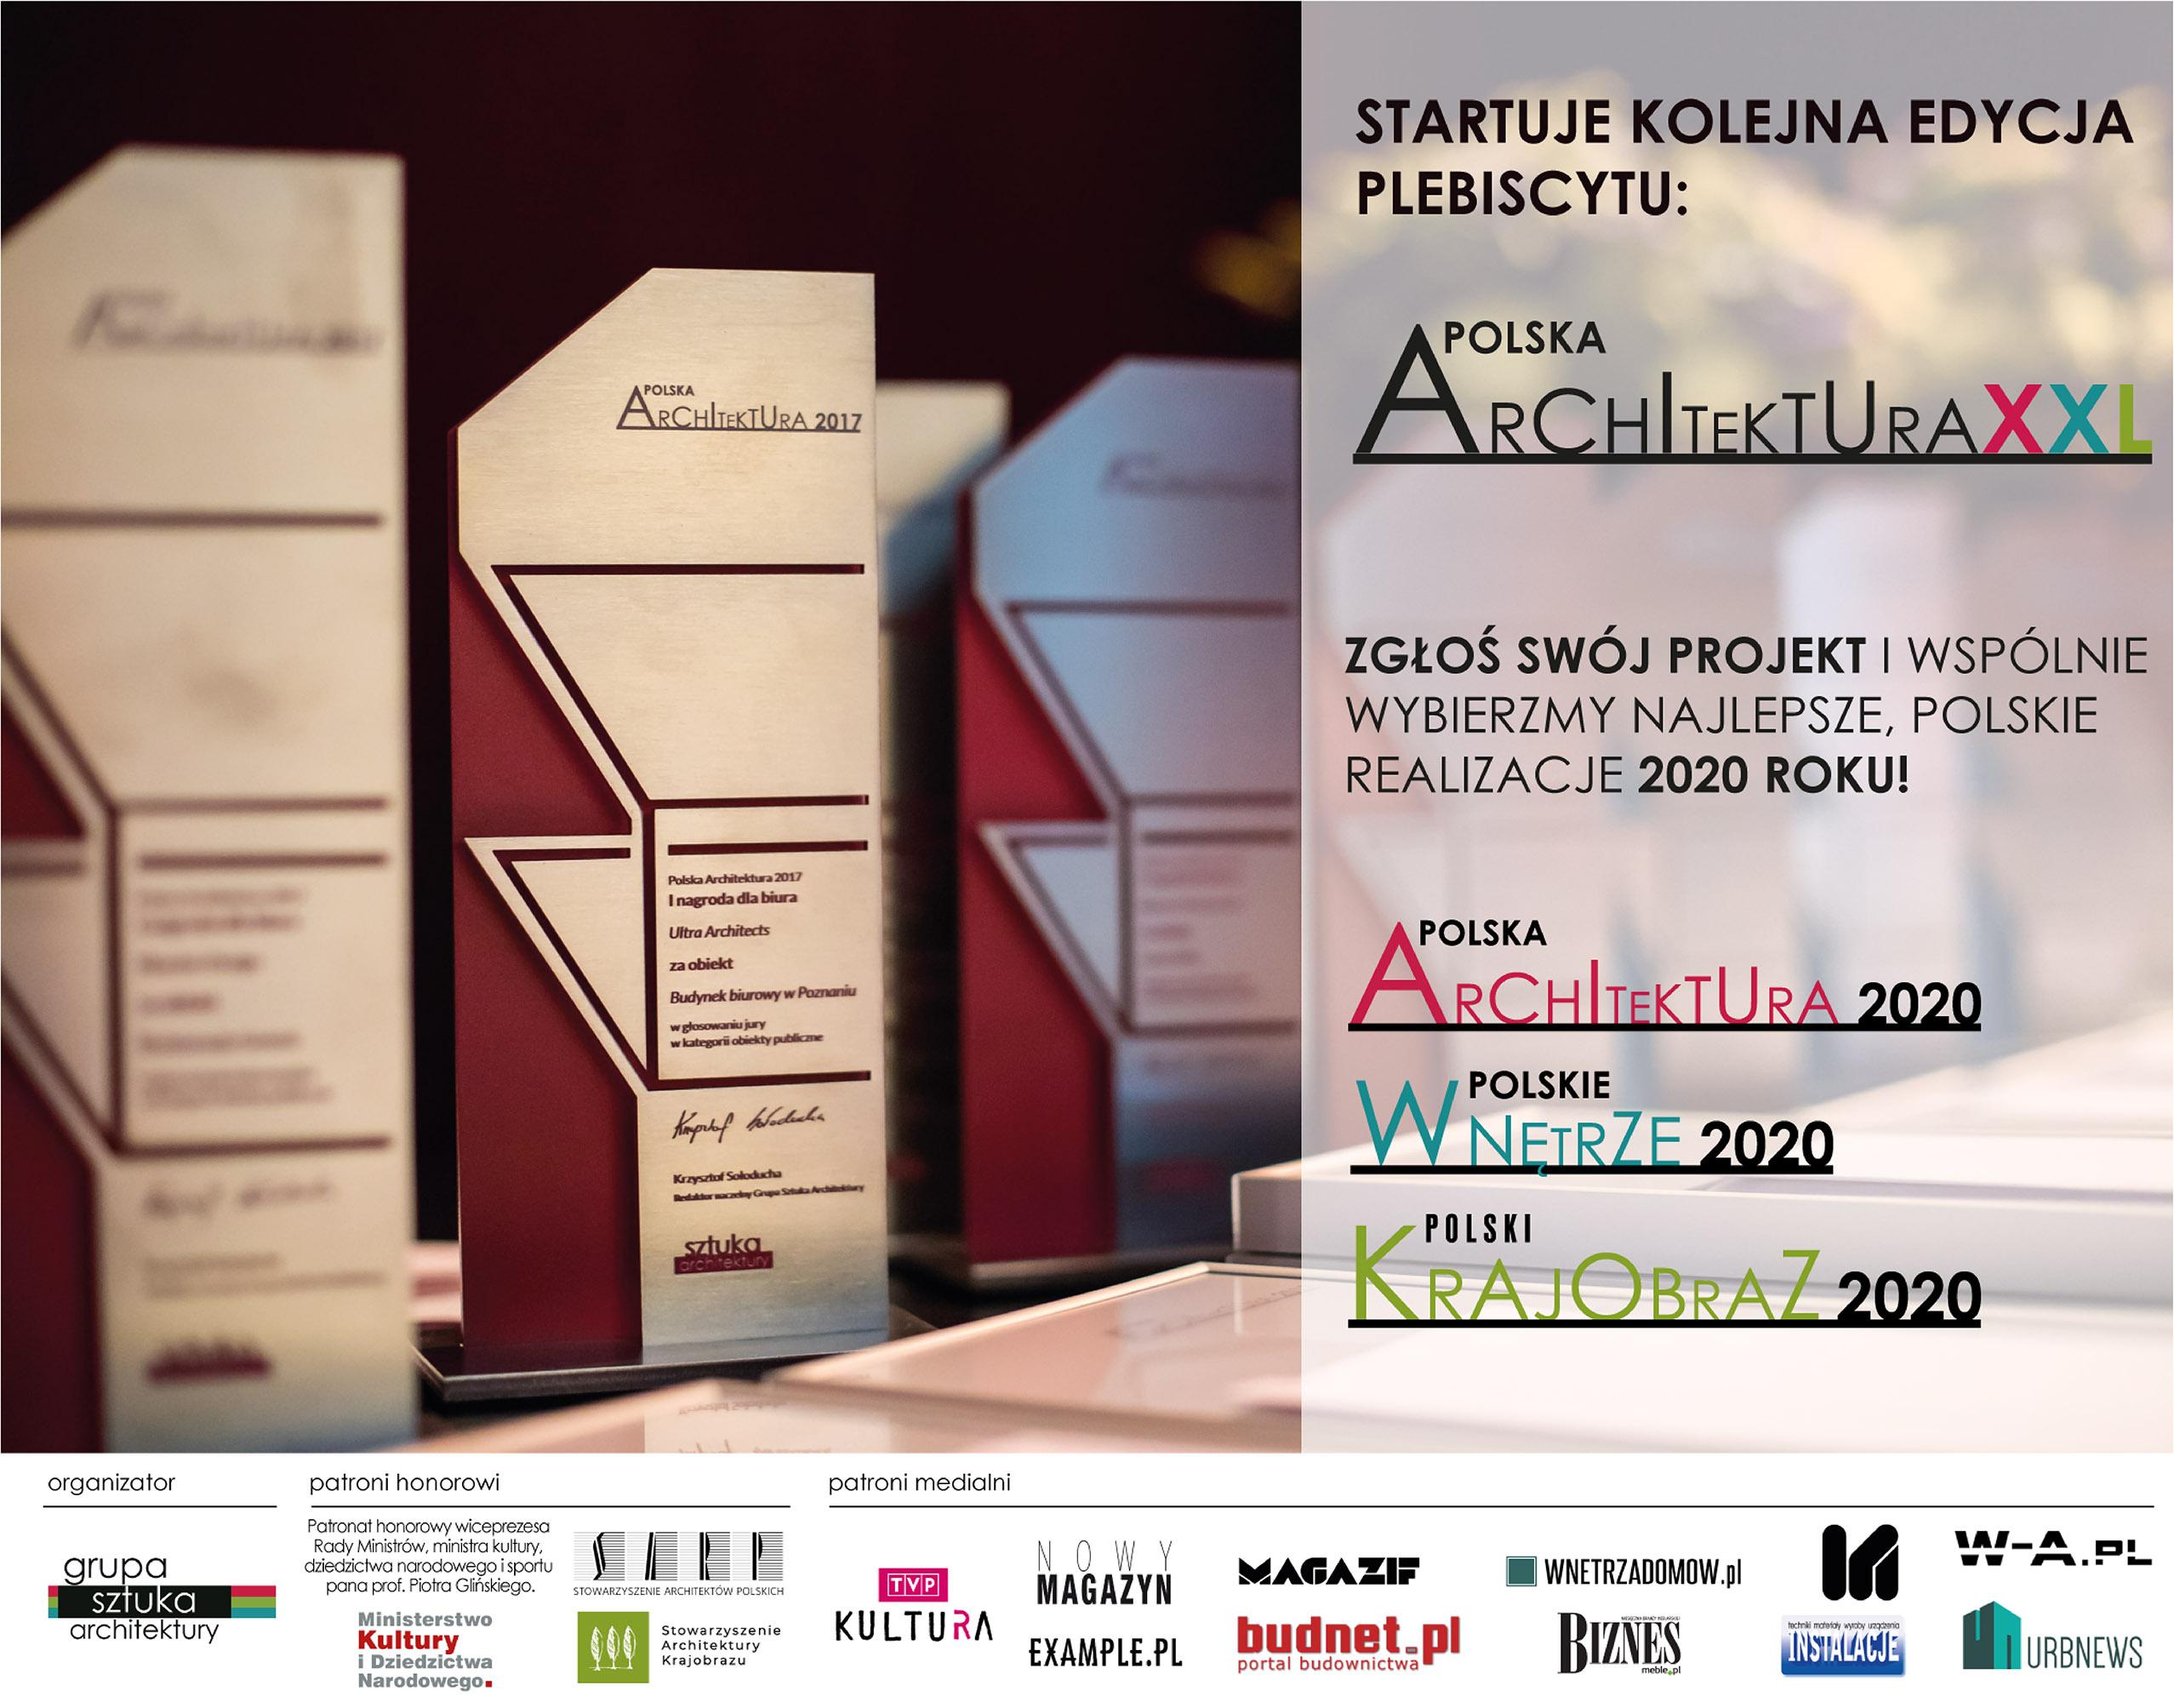 PolskaArchitekturaXXL_2020